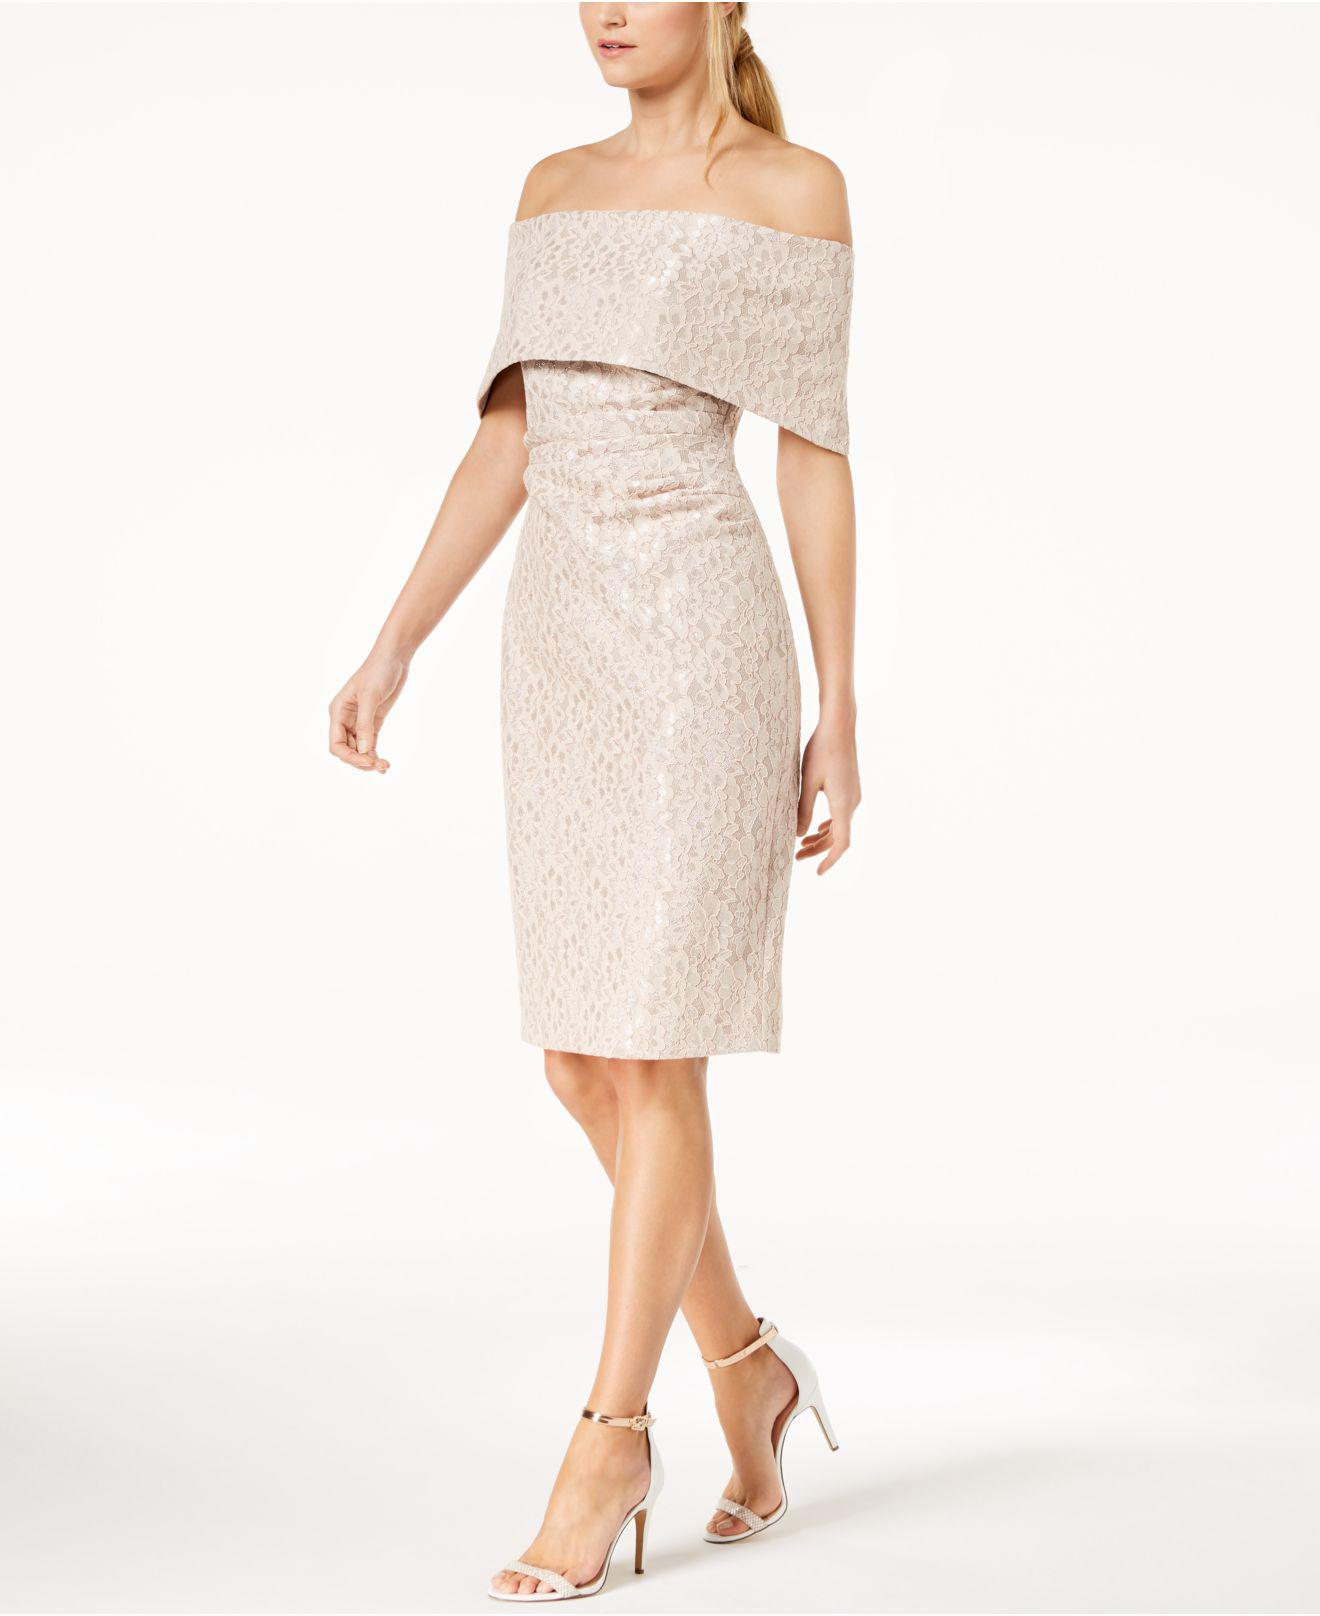 2f46106915d5 Vince Camuto Lace Off-the-shoulder Sheath Dress - Lyst